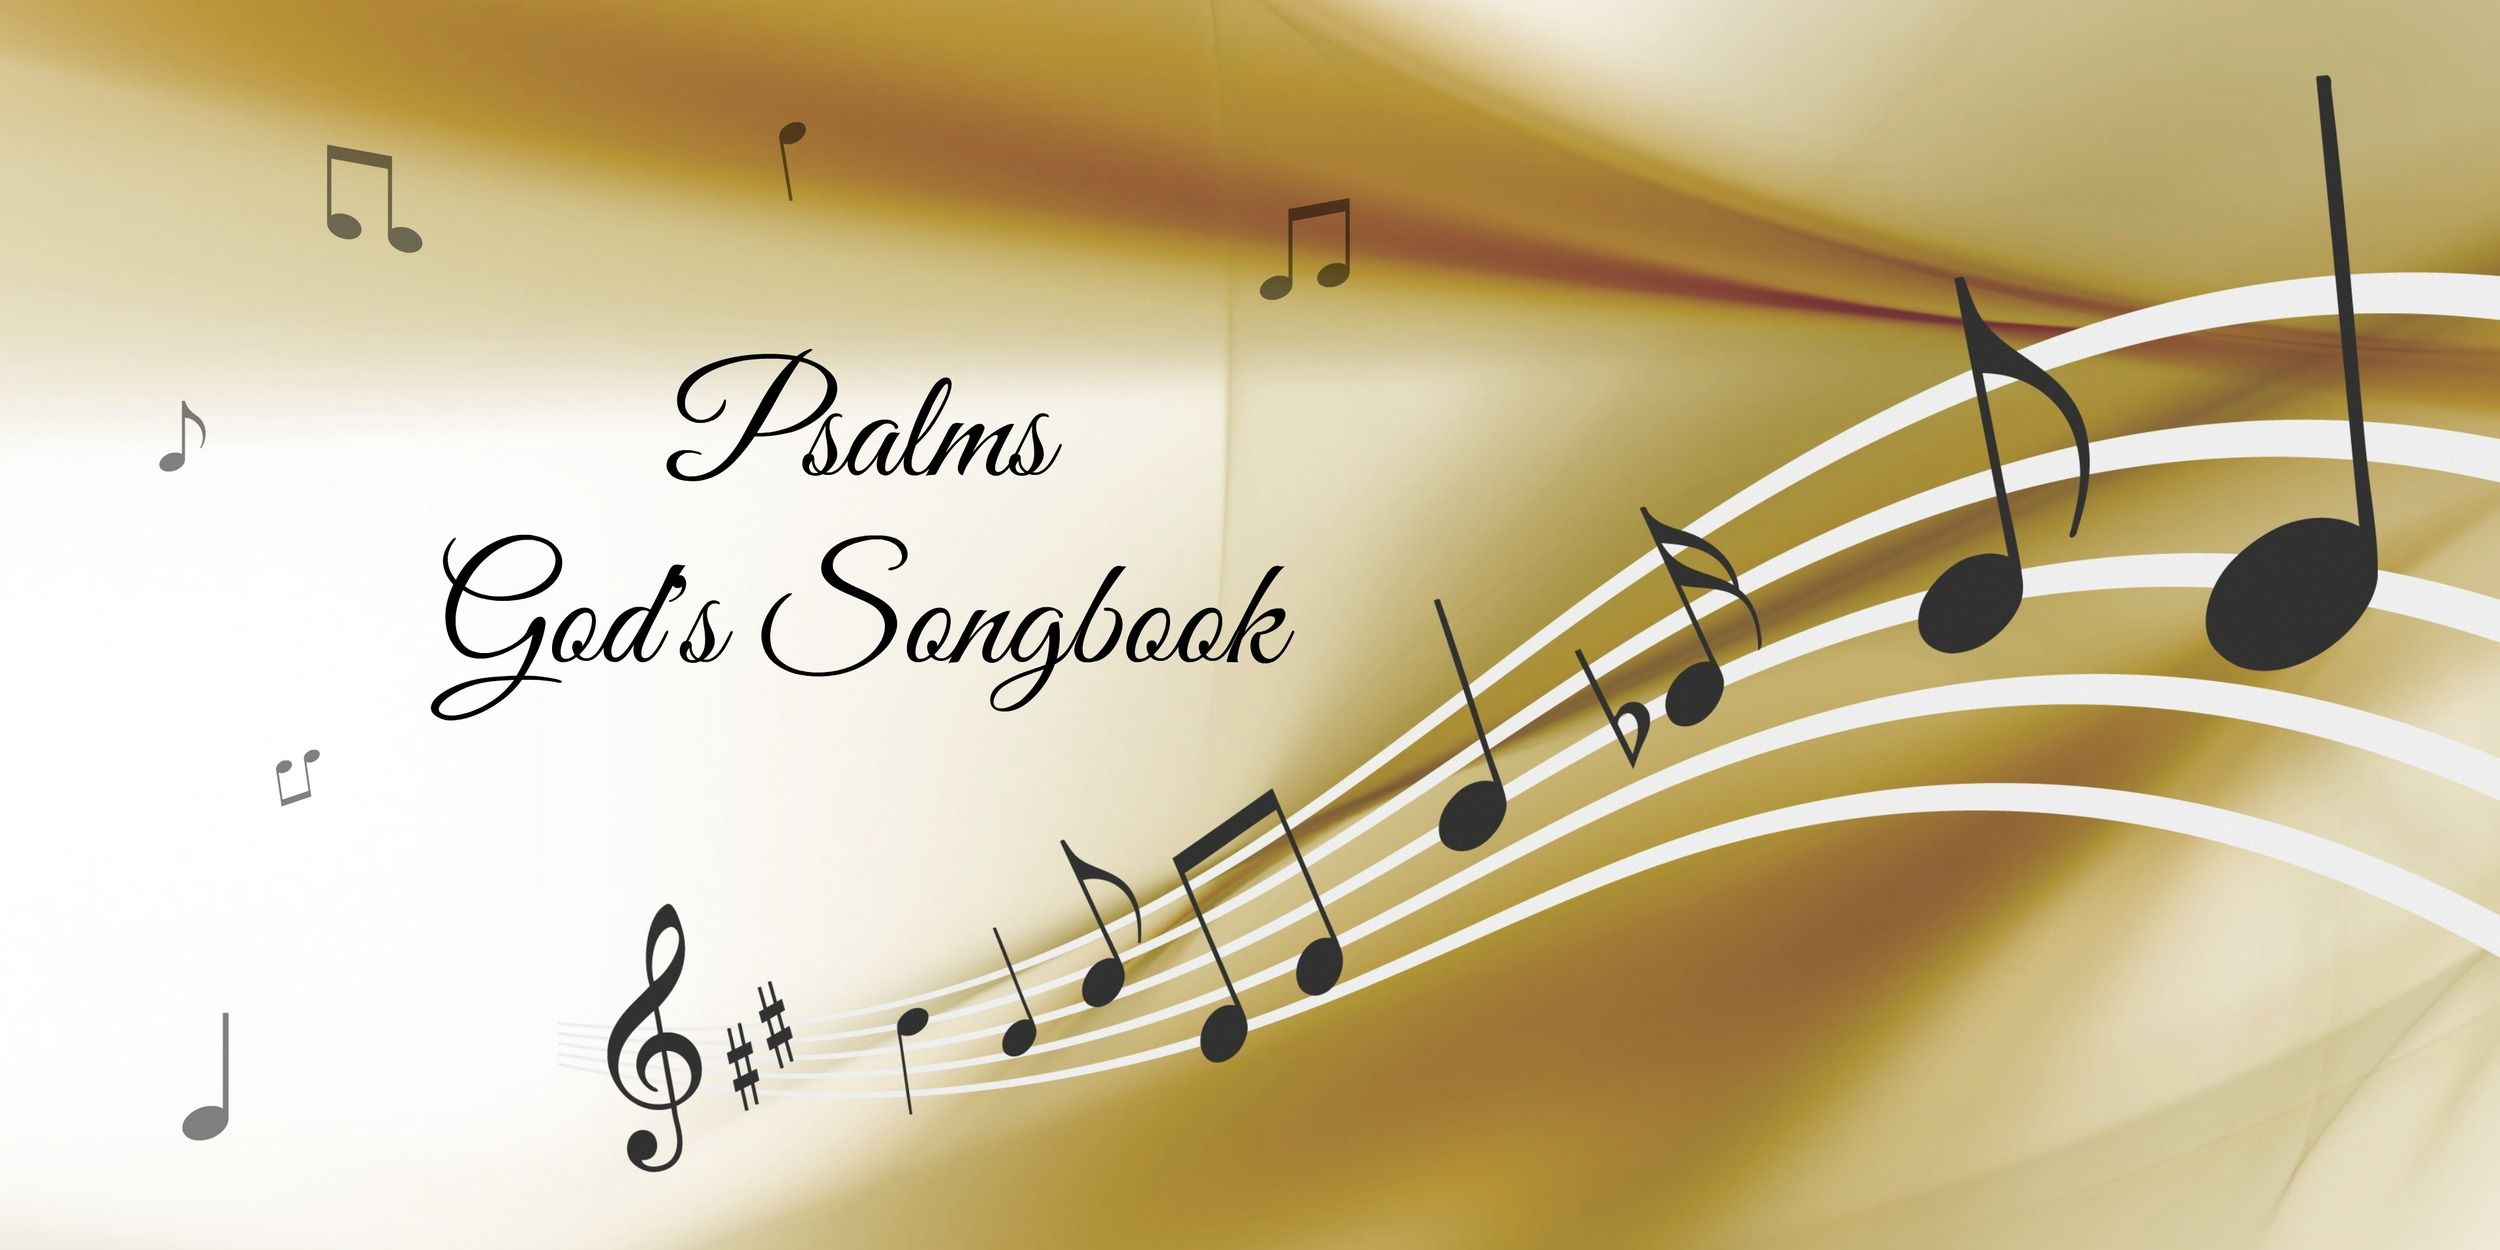 Revival Psalm 85 1 13 Freedom Baptist Church Psalms Psalm 106 Psalm 131